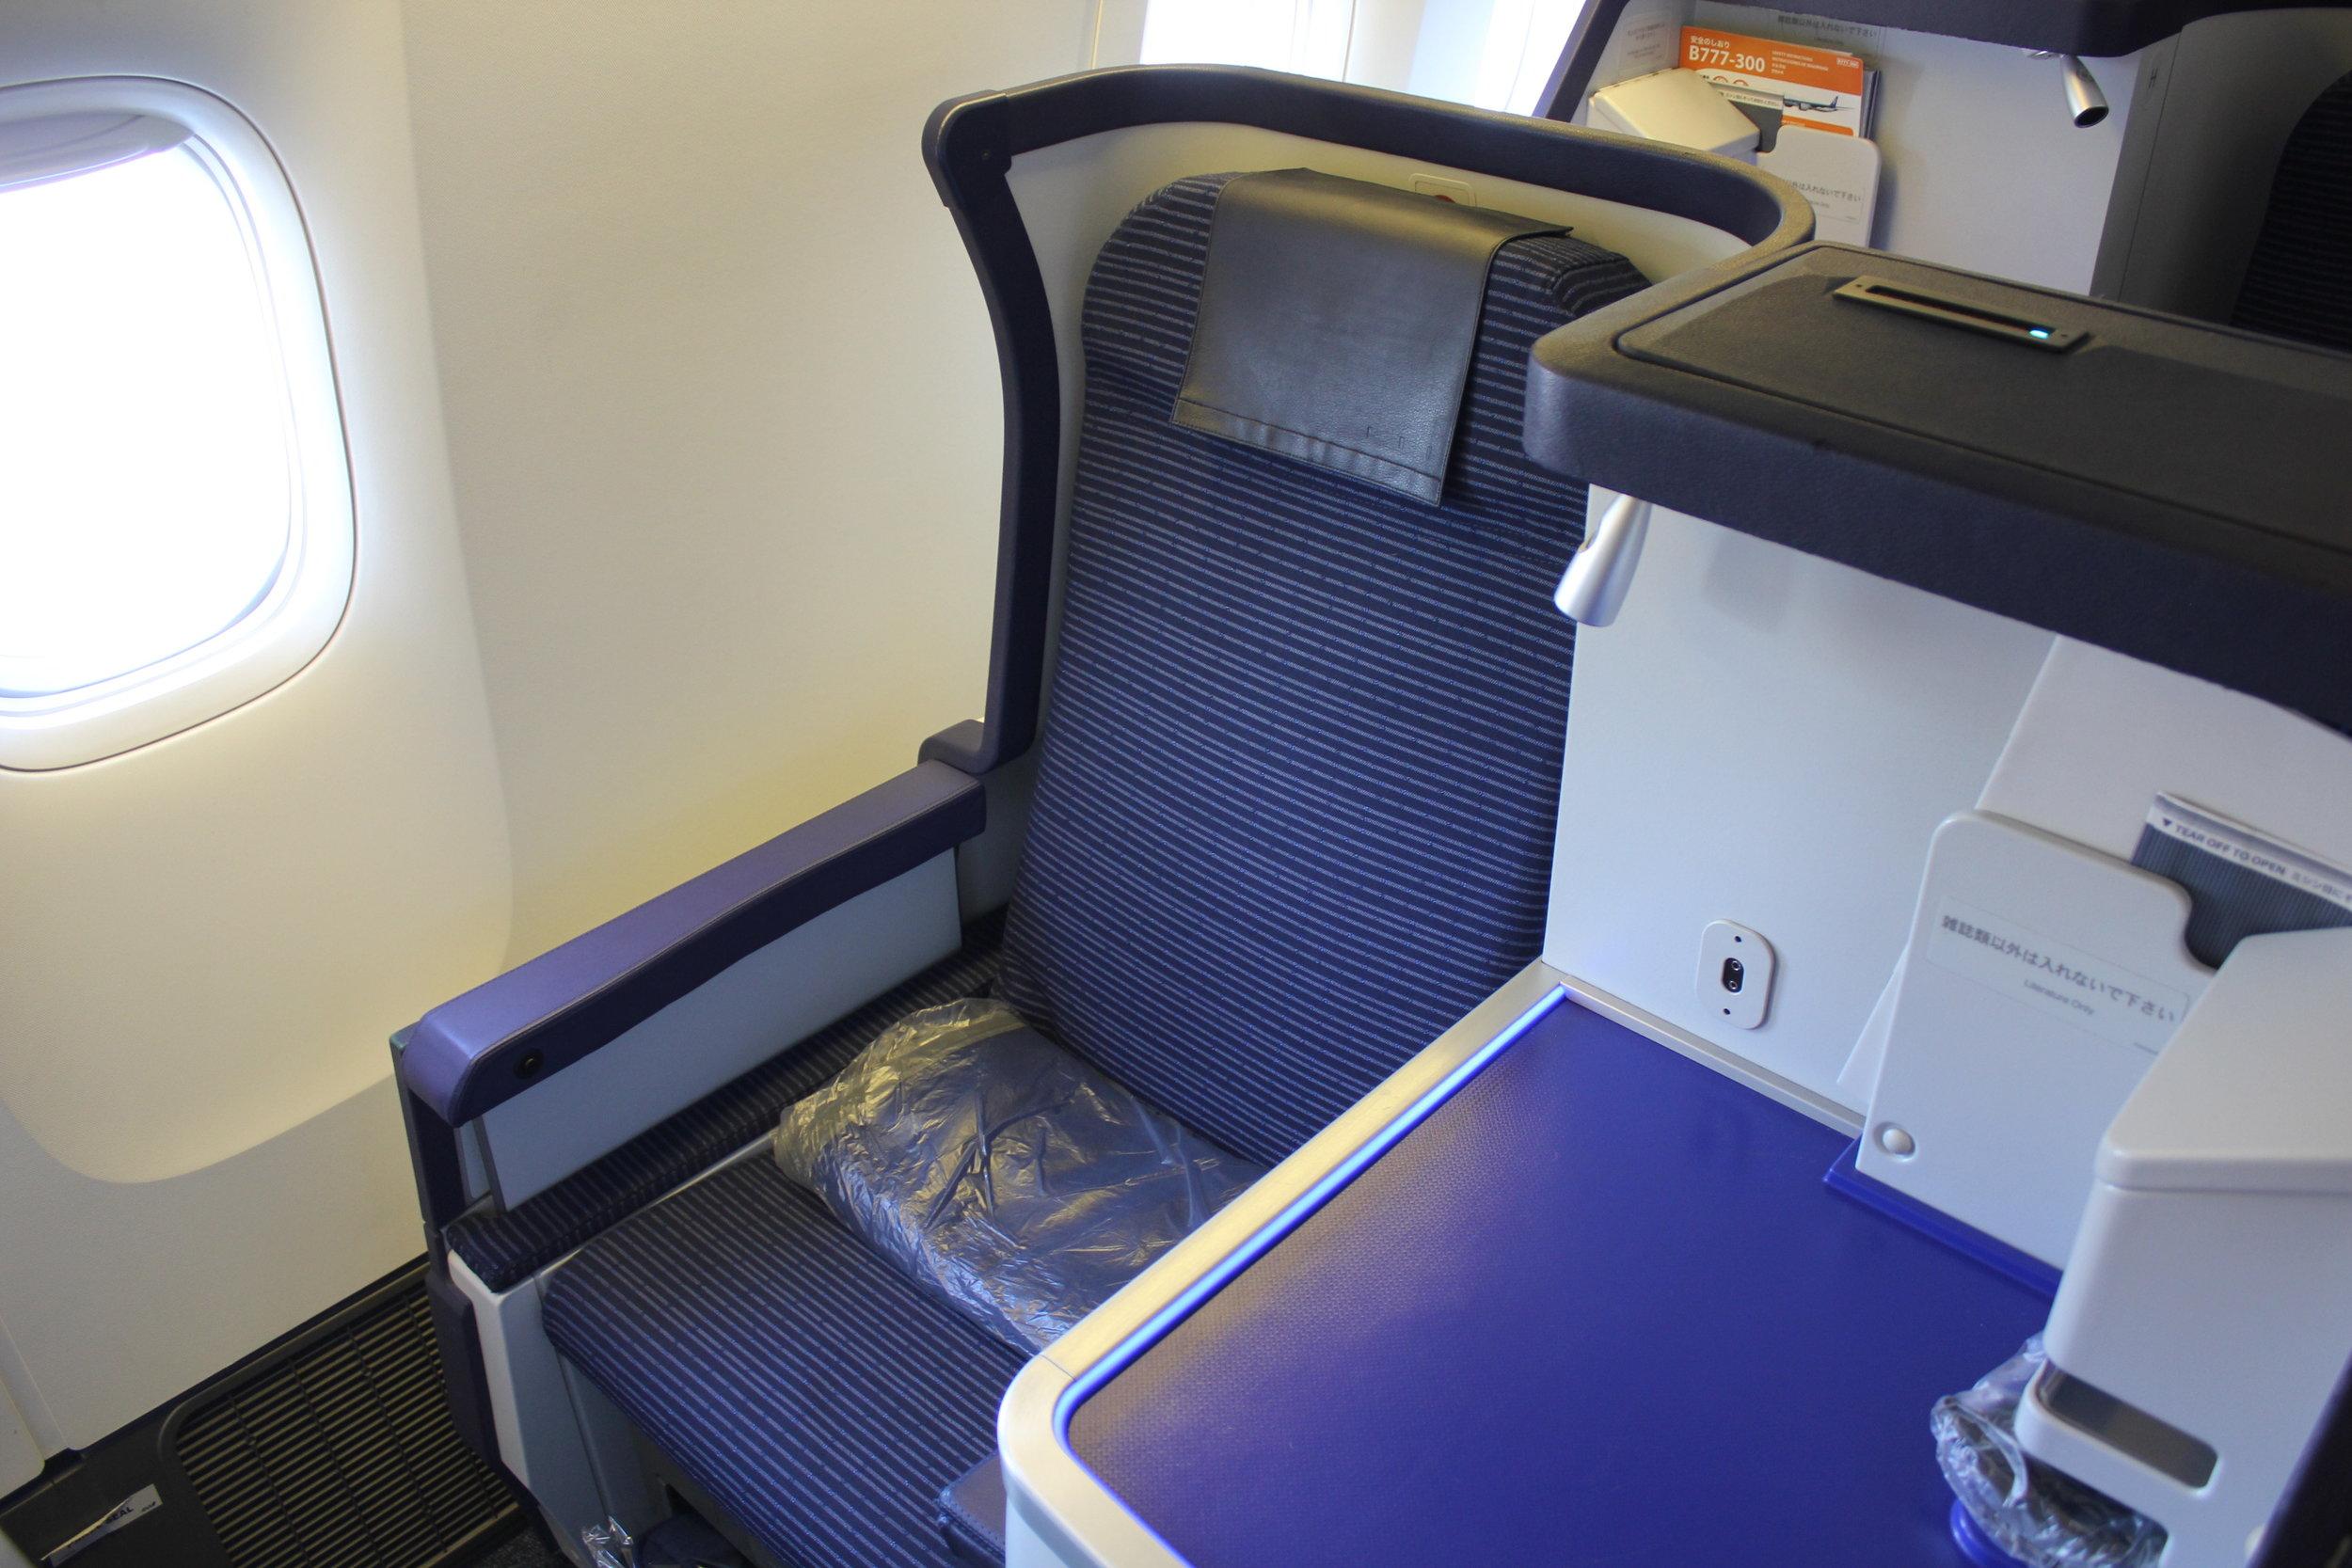 ANA 777 business class – Seat 12K